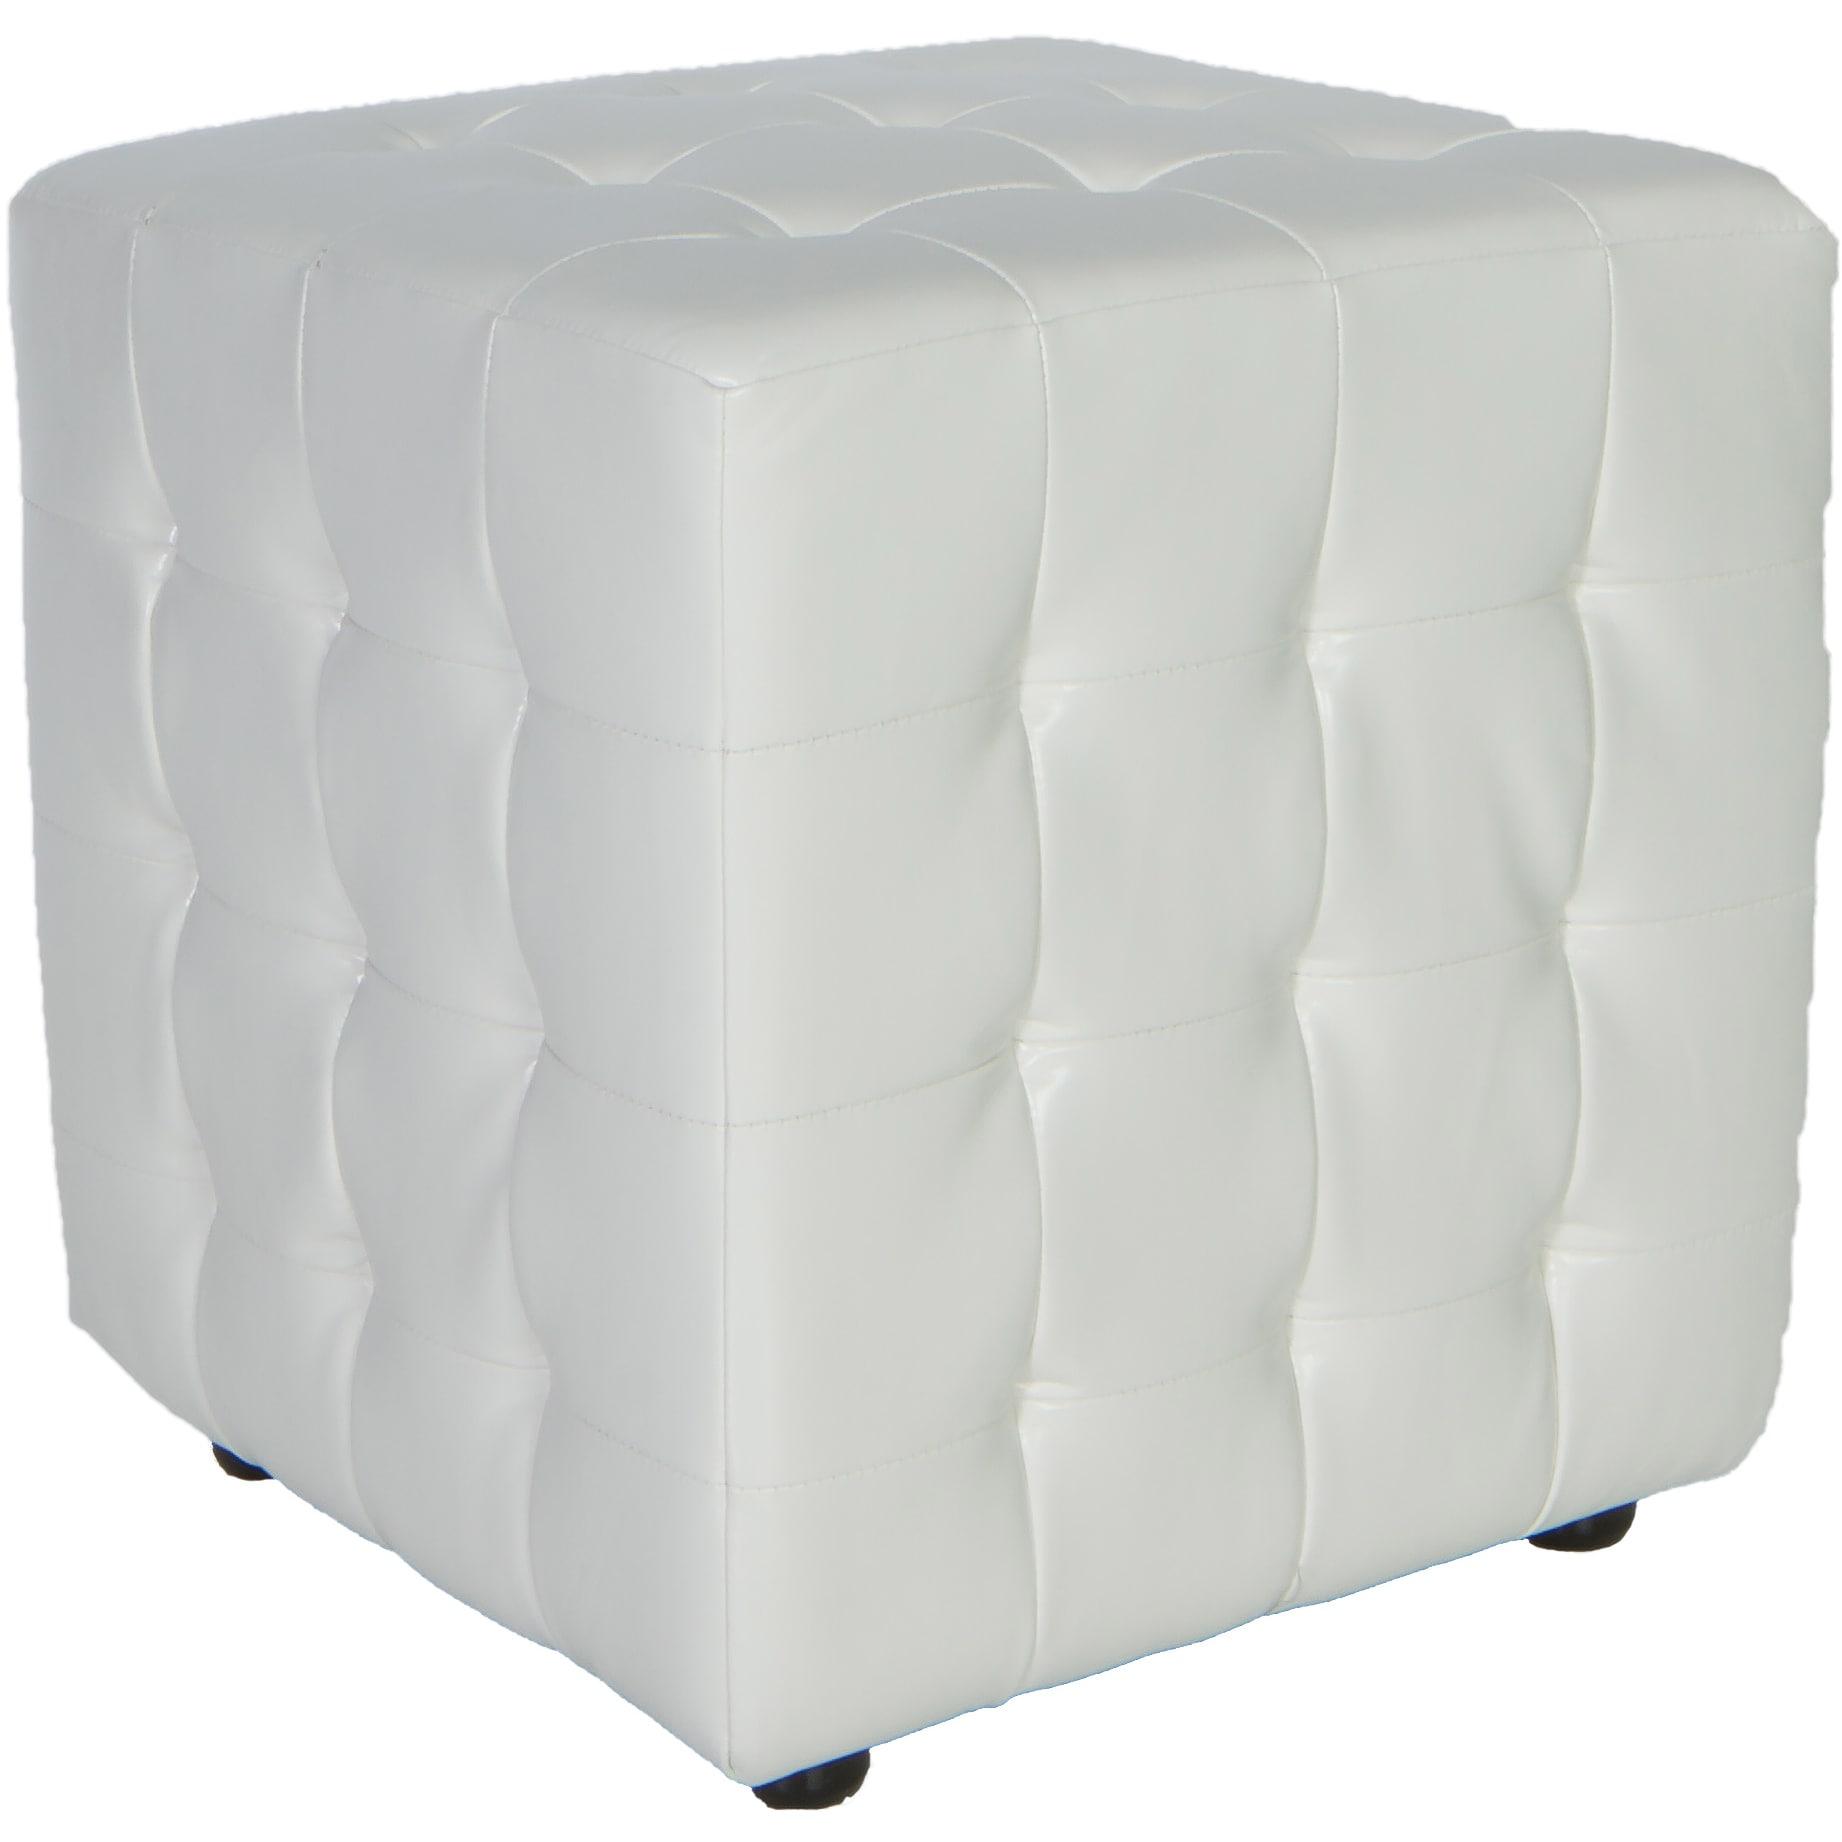 Awe Inspiring Porch Den Lawndale White Tufted Cube Ottoman Creativecarmelina Interior Chair Design Creativecarmelinacom